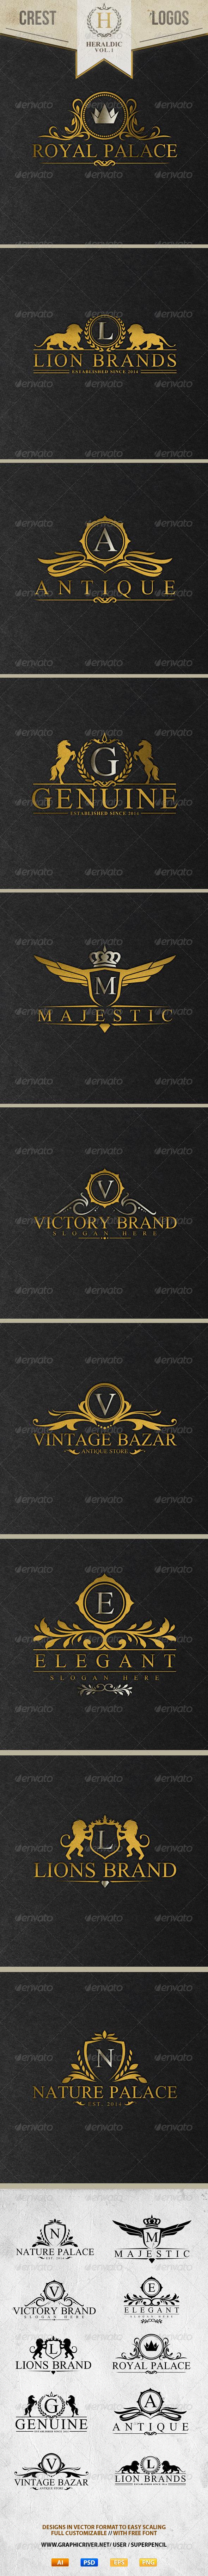 GraphicRiver Heraldic Crest Logos Vol.1 8586660